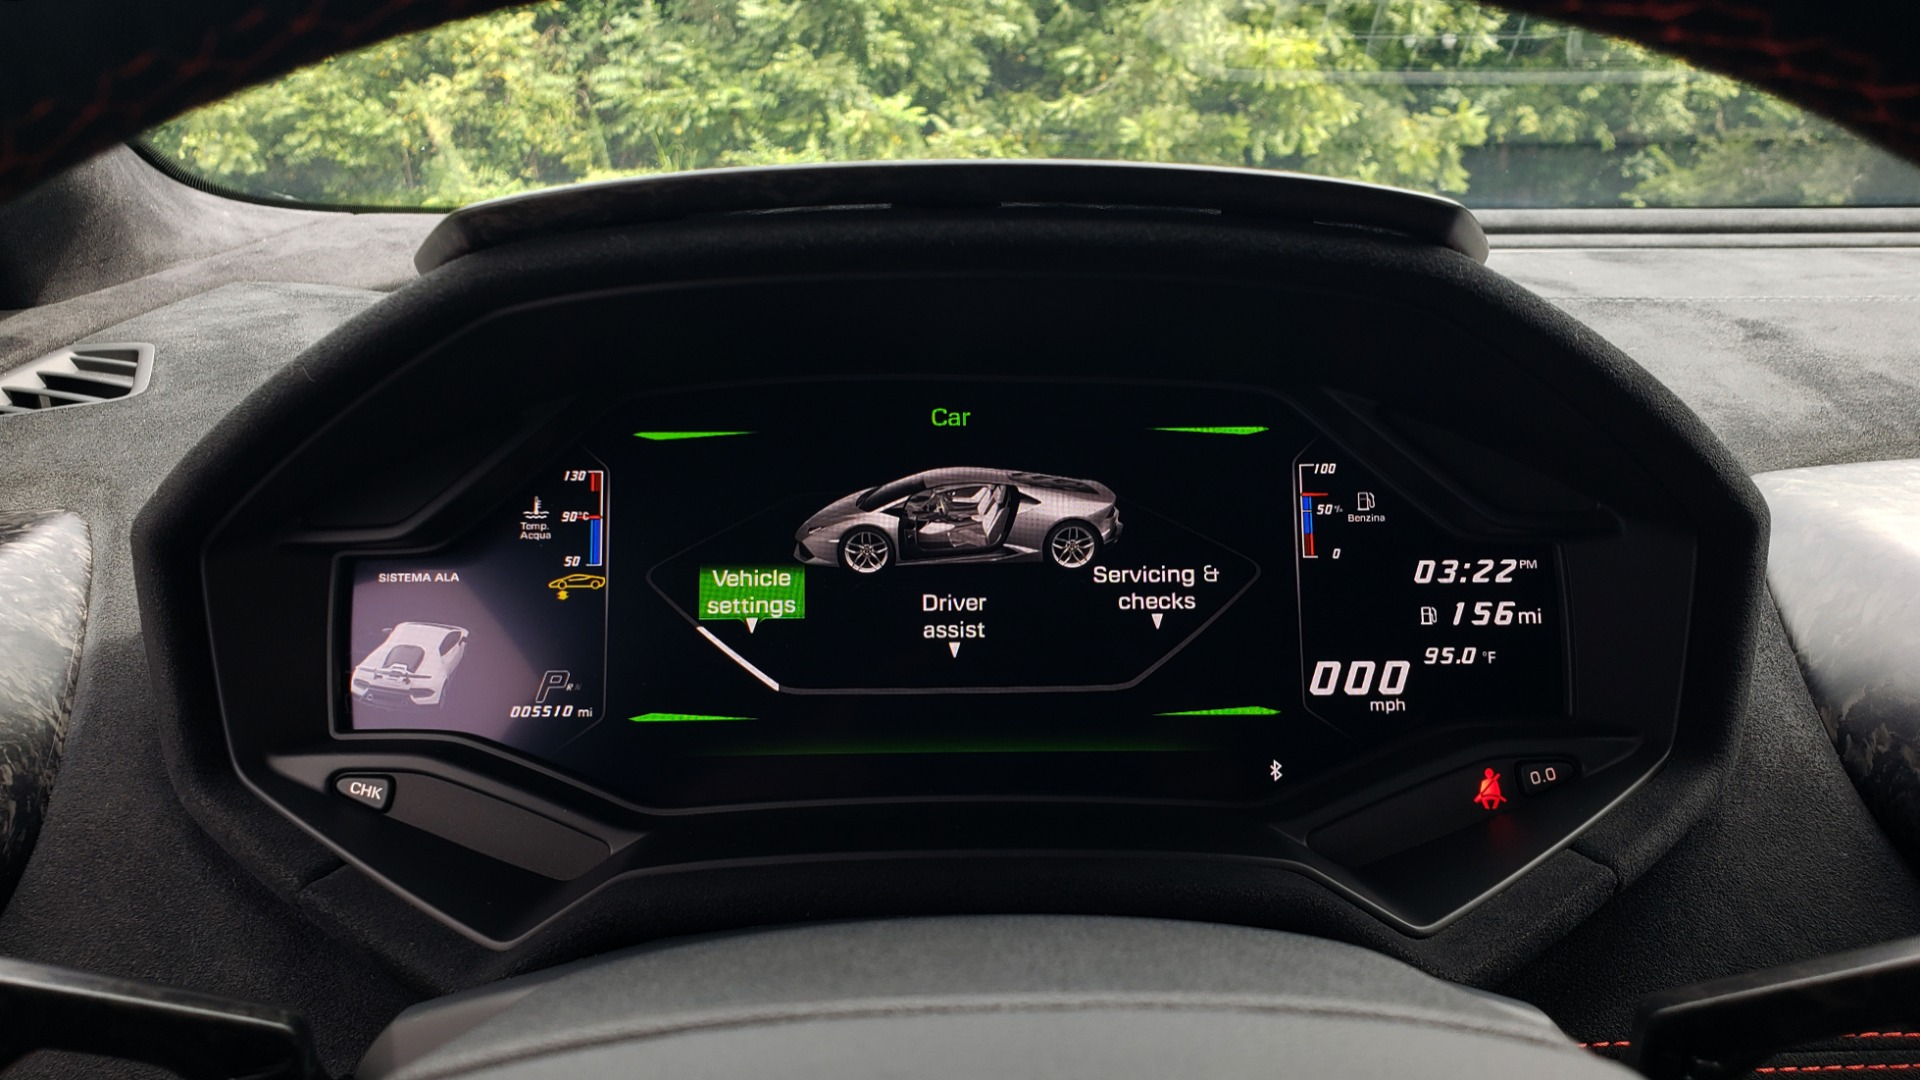 Used 2018 Lamborghini HURACAN PERFORMANTE 5.2L V10 / 630HP / 7-SPD AUTO / AWD / NAV / PREM SND for sale $269,995 at Formula Imports in Charlotte NC 28227 42